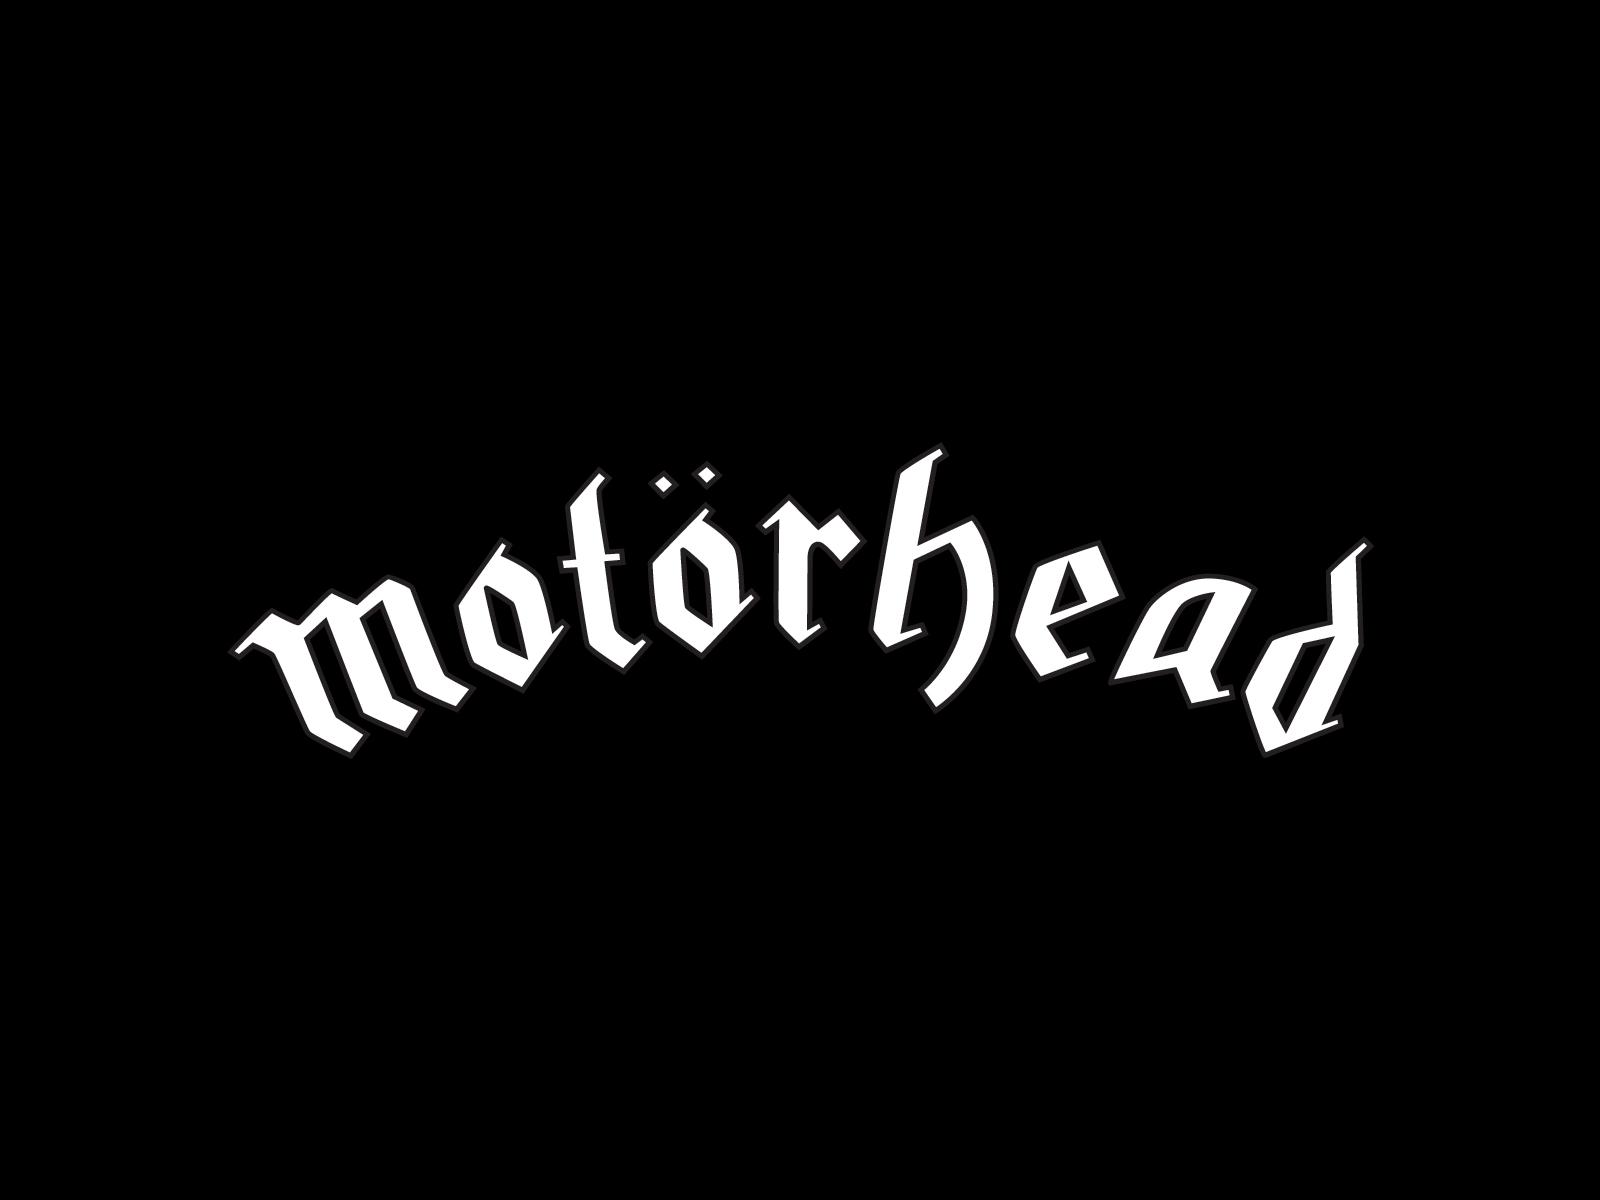 Motorhead • 2014 Tour